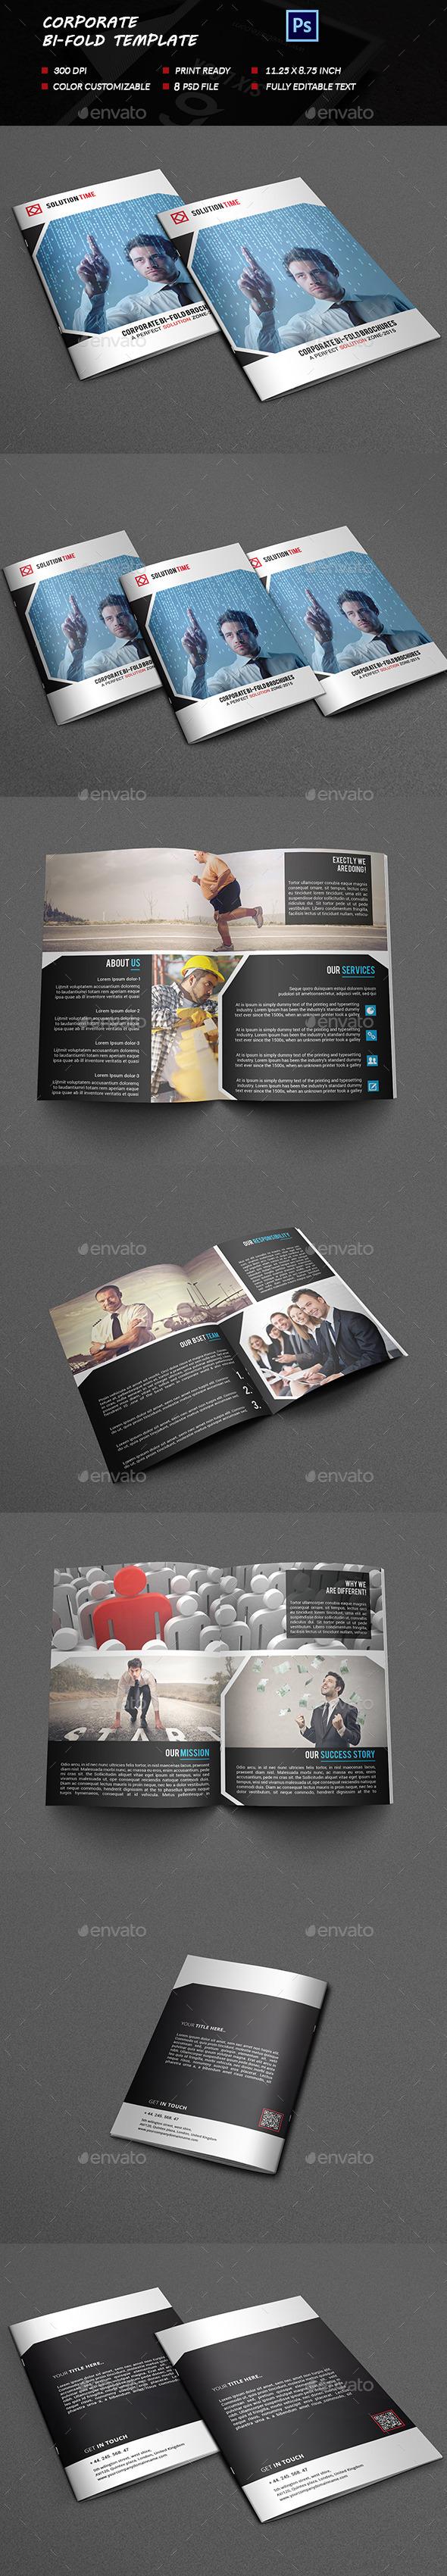 Corporate Bi-fold Brochure Template - Brochures Print Templates